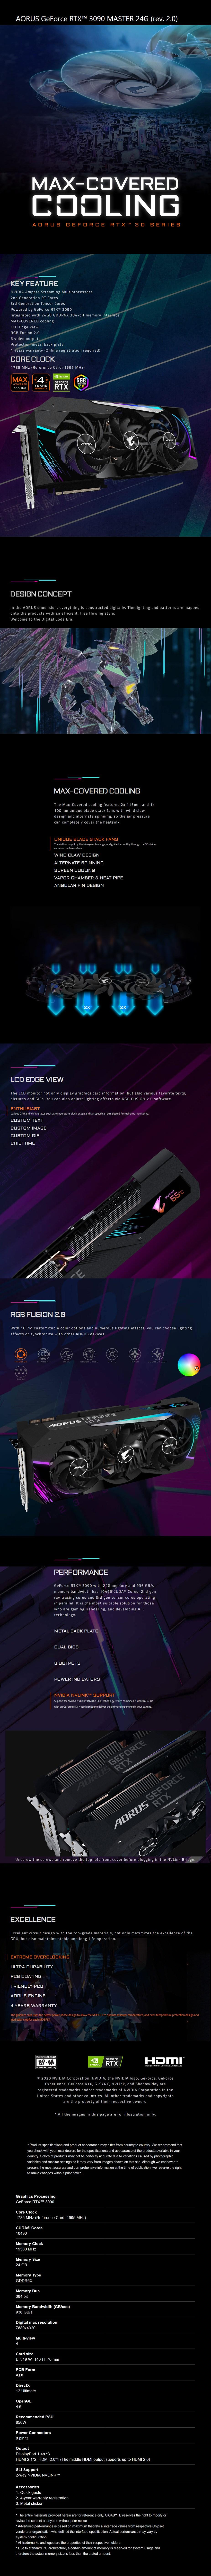 Gigabyte GeForce RTX 3090 AORUS MASTER 24GB V2 Video Card - Desktop Overview 1